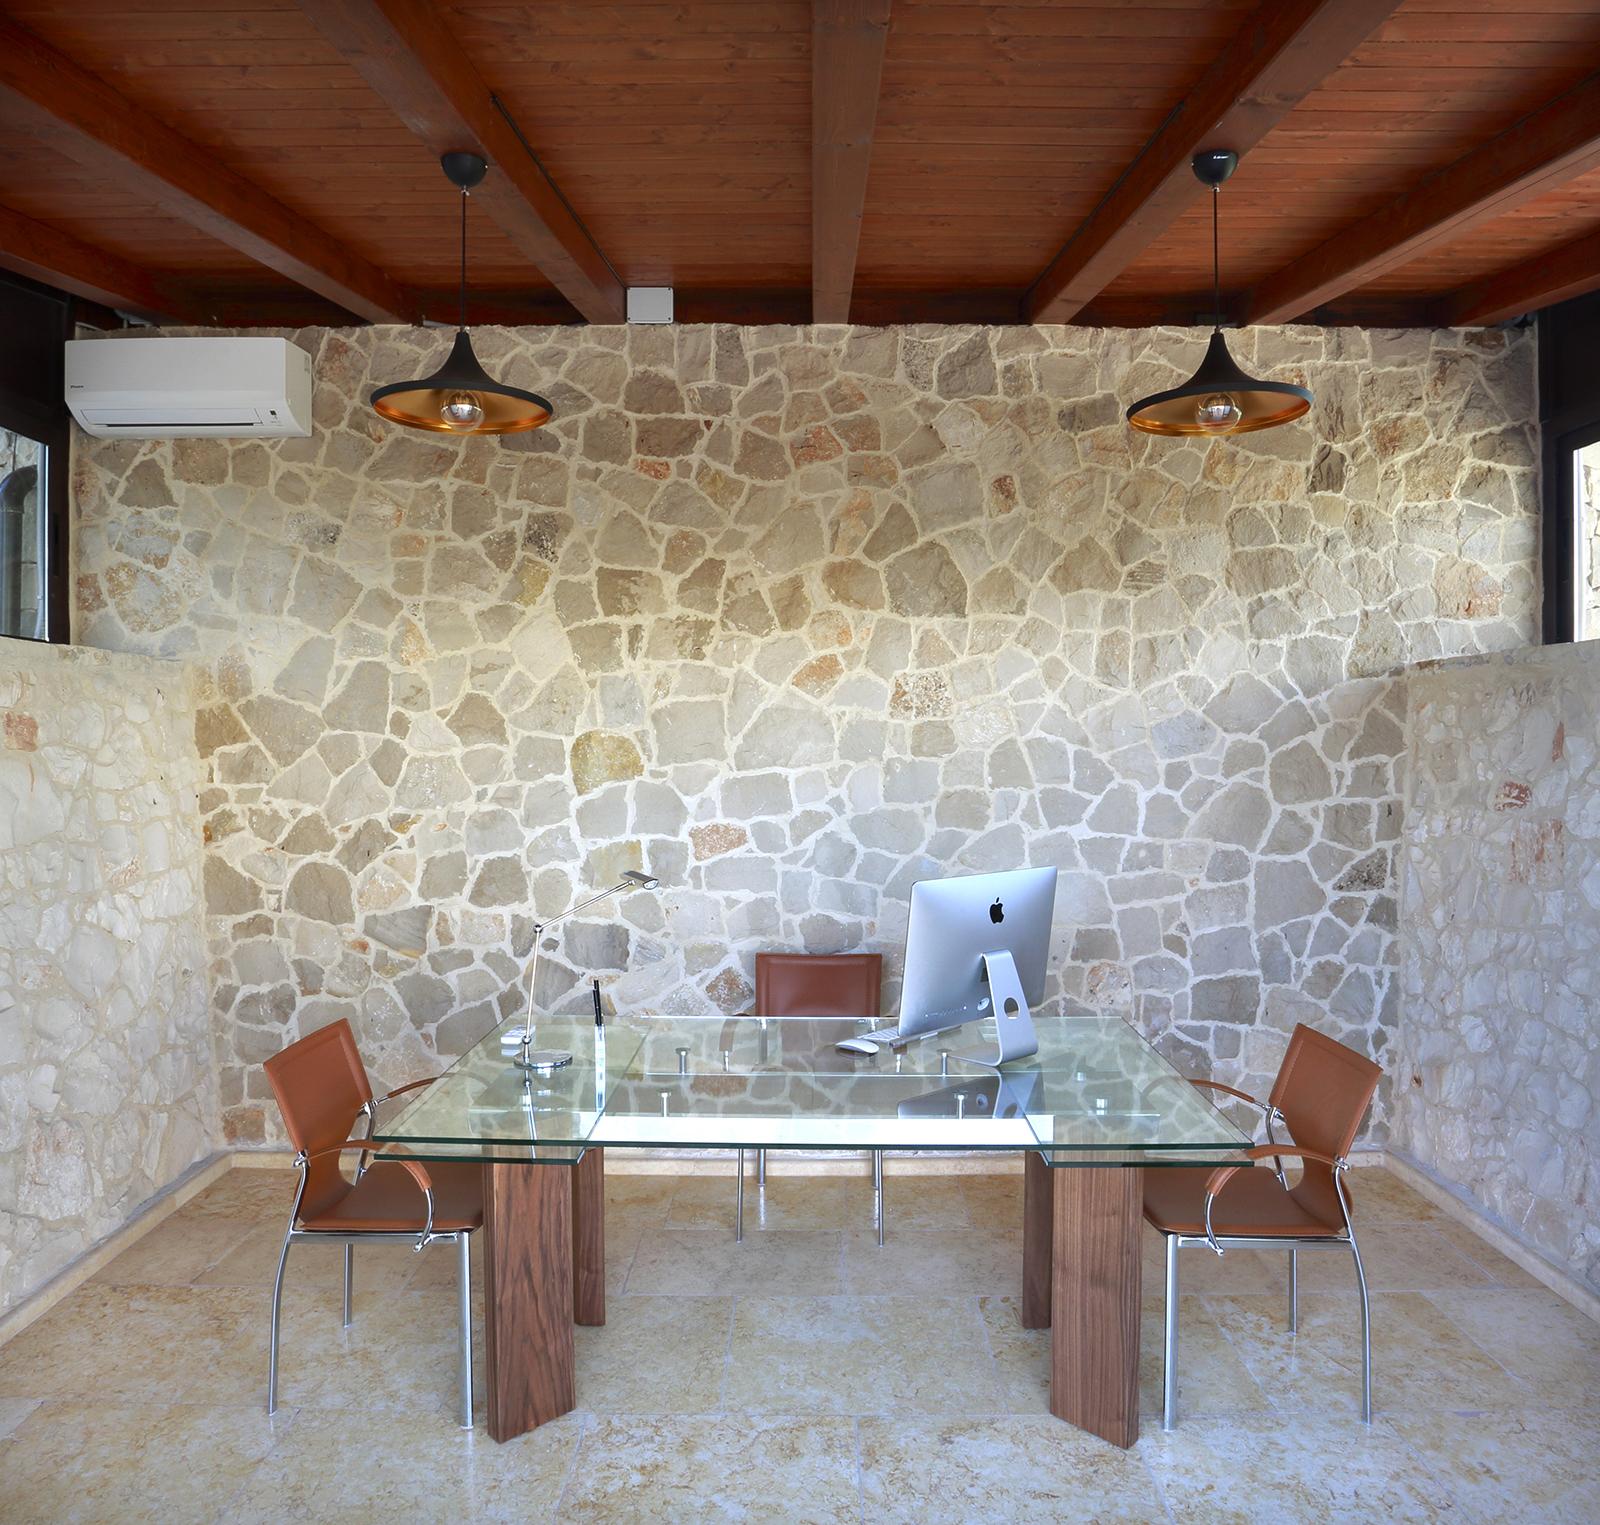 Cuisine Integree Dans Salon ferrocino resort : une luxueuse villa située dans le sud de